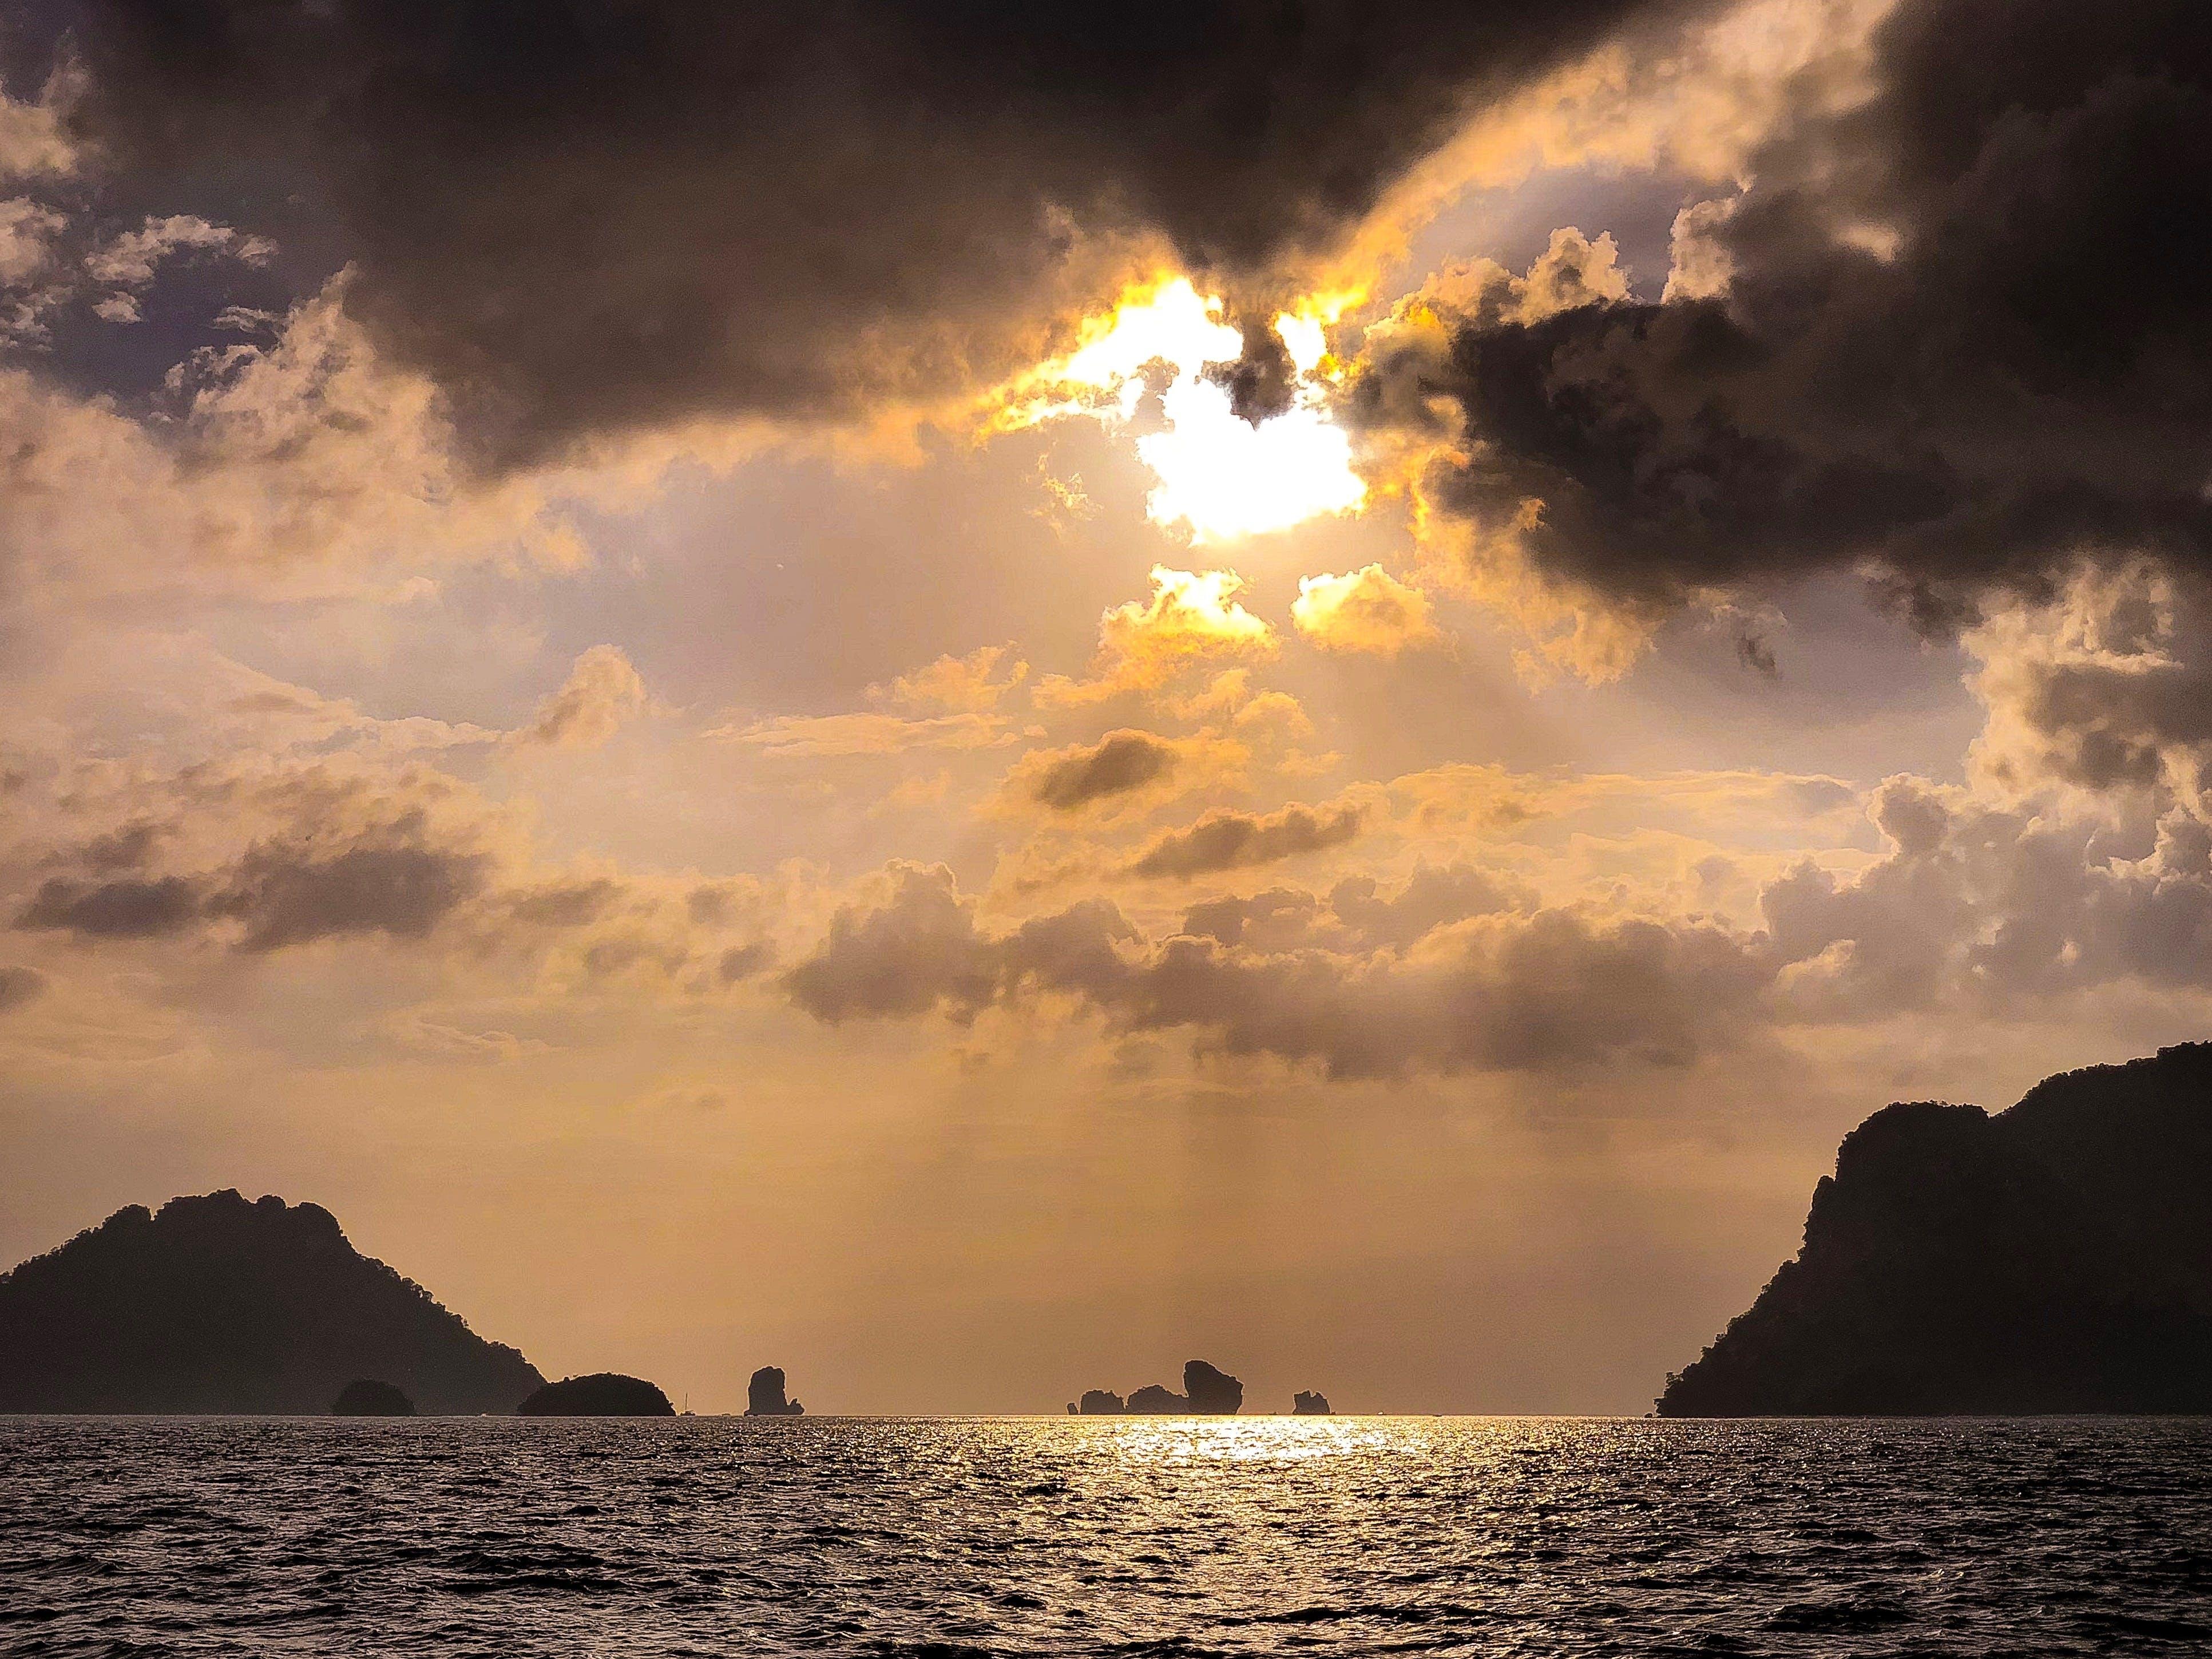 Sun Rays over Sea With Islands